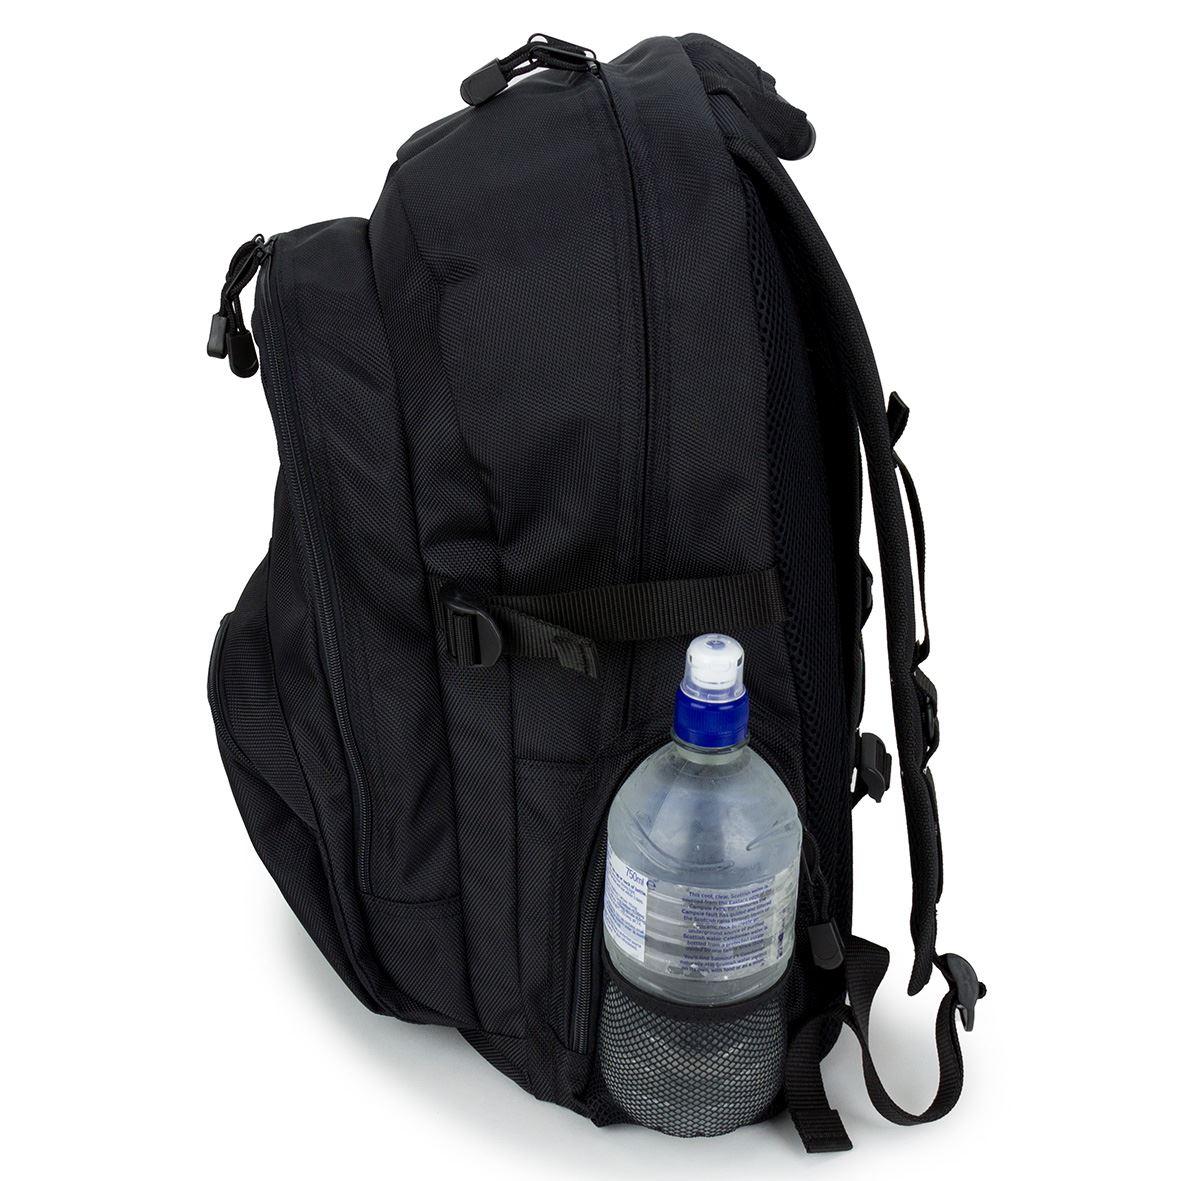 Рюкзак для ноутбука targus cn600 black продам рюкзак баск